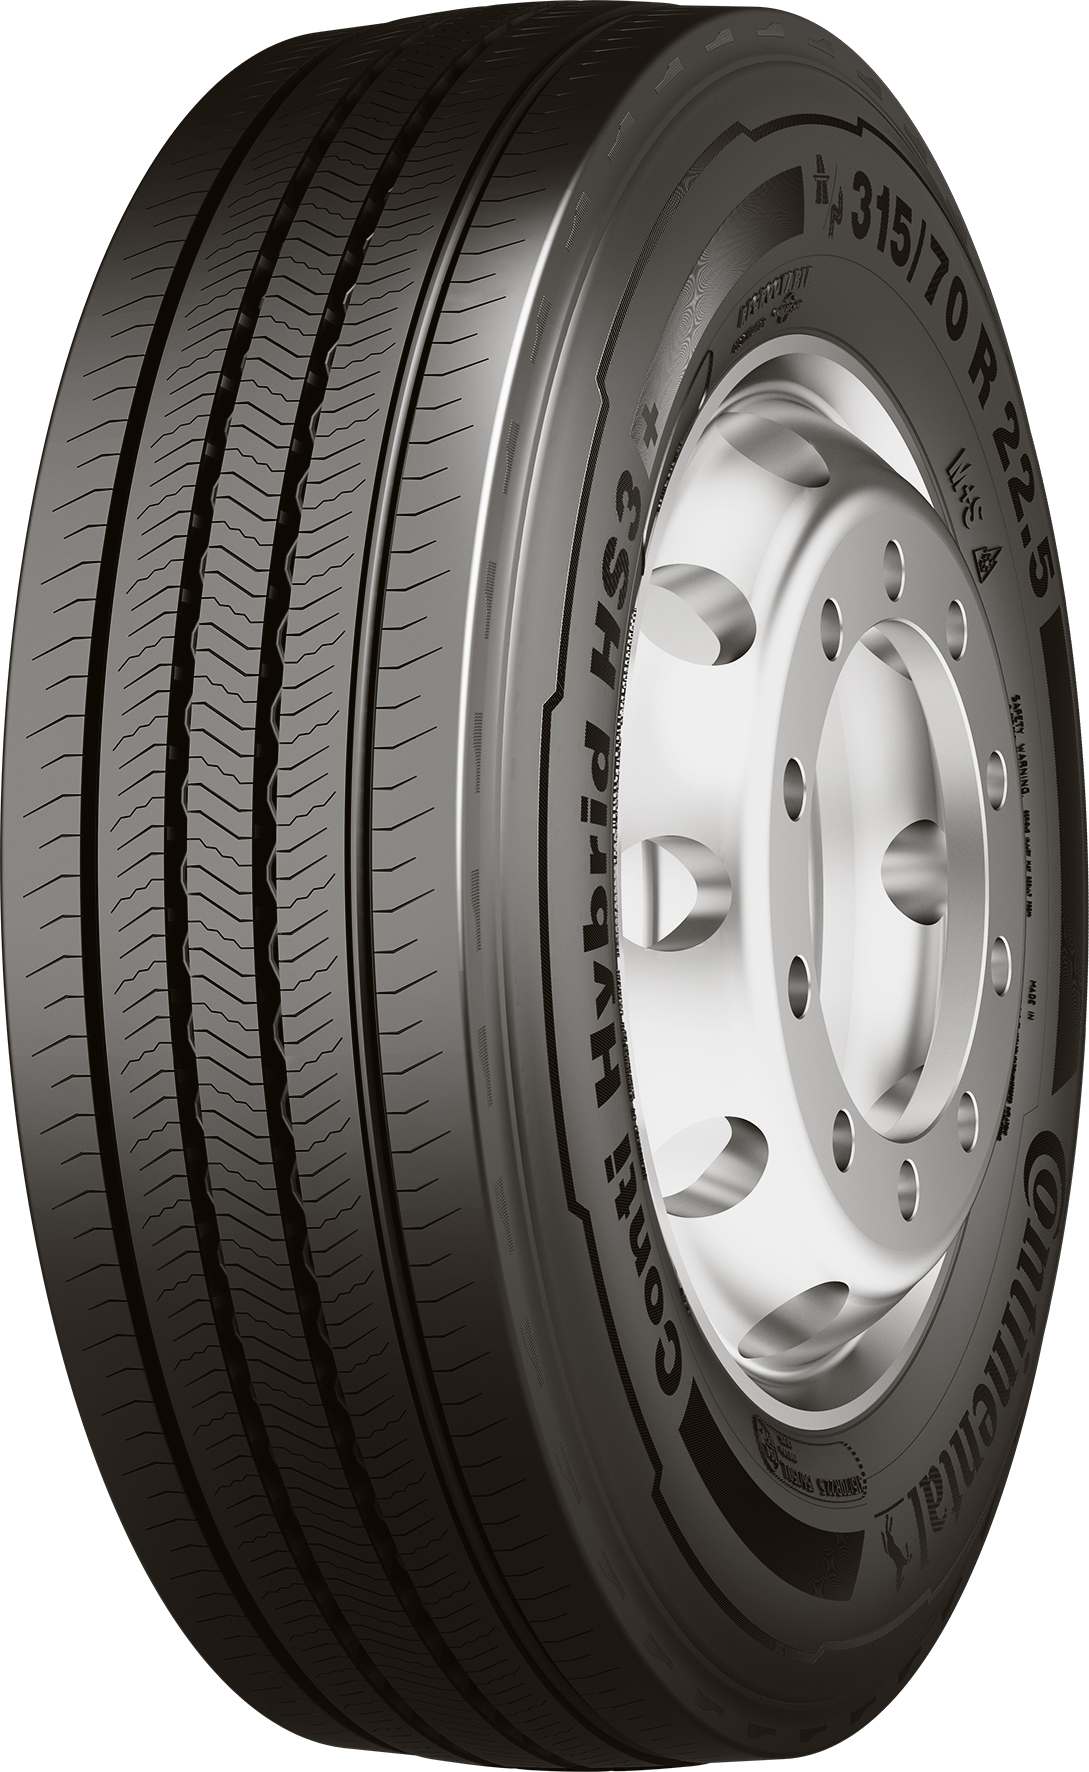 New Conti Hybrid HS3+ improves performance